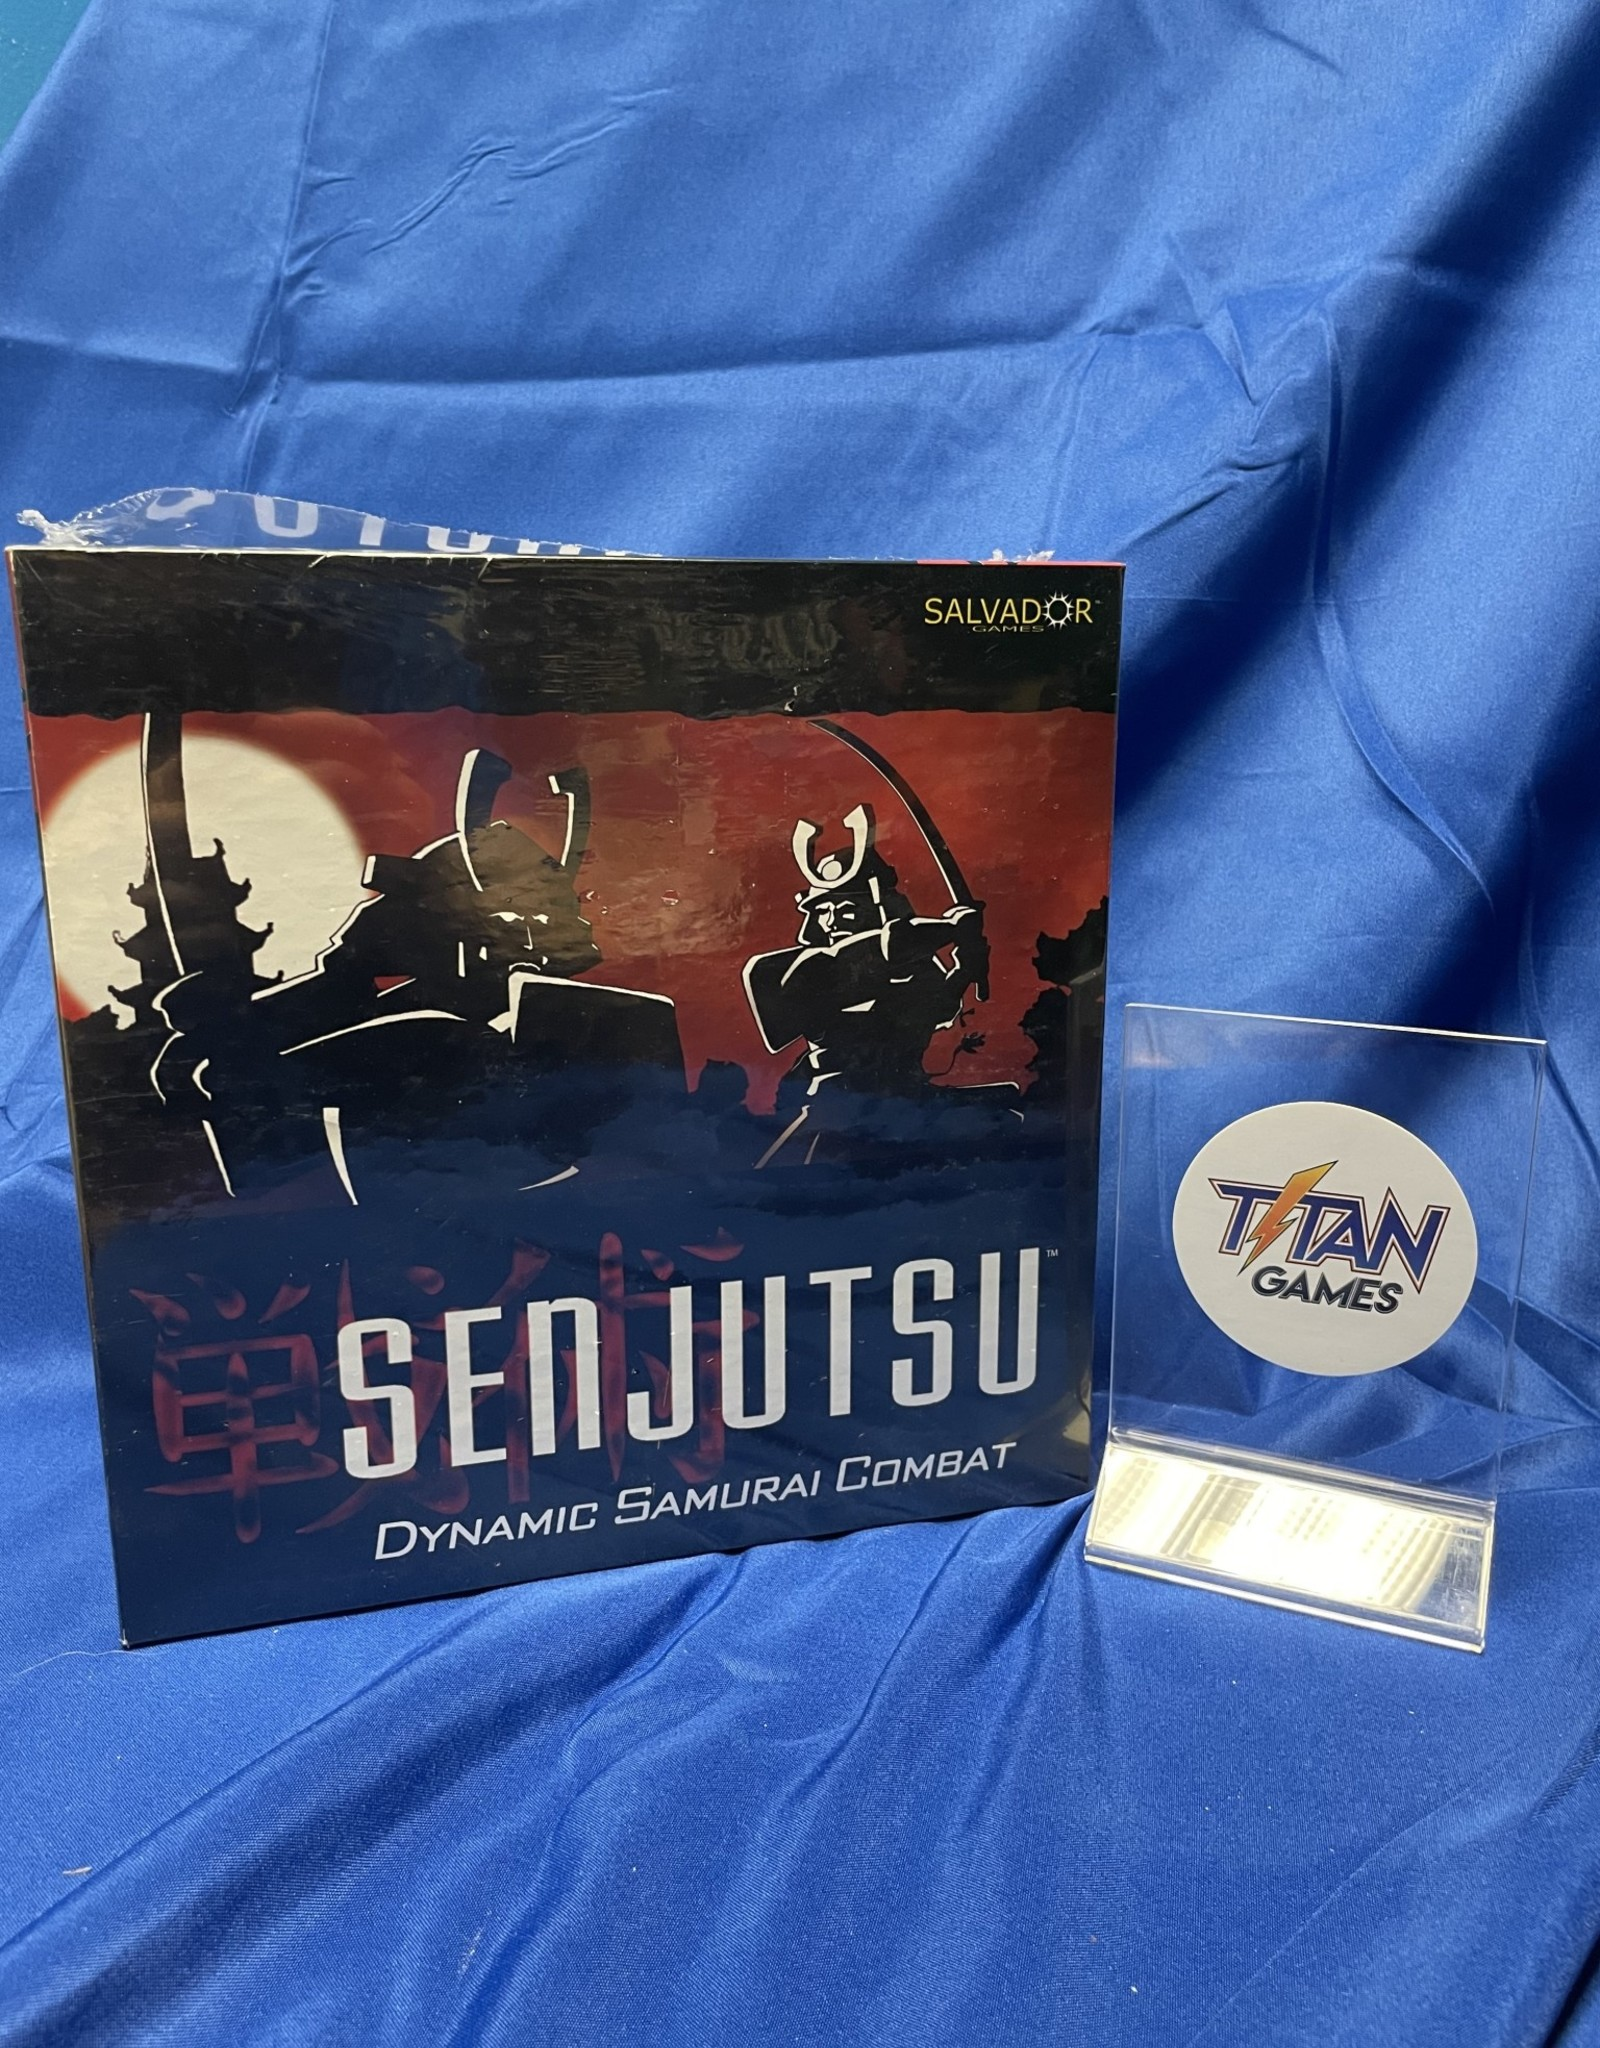 UBGS Senjutsu, Dynamic Samurai Combat